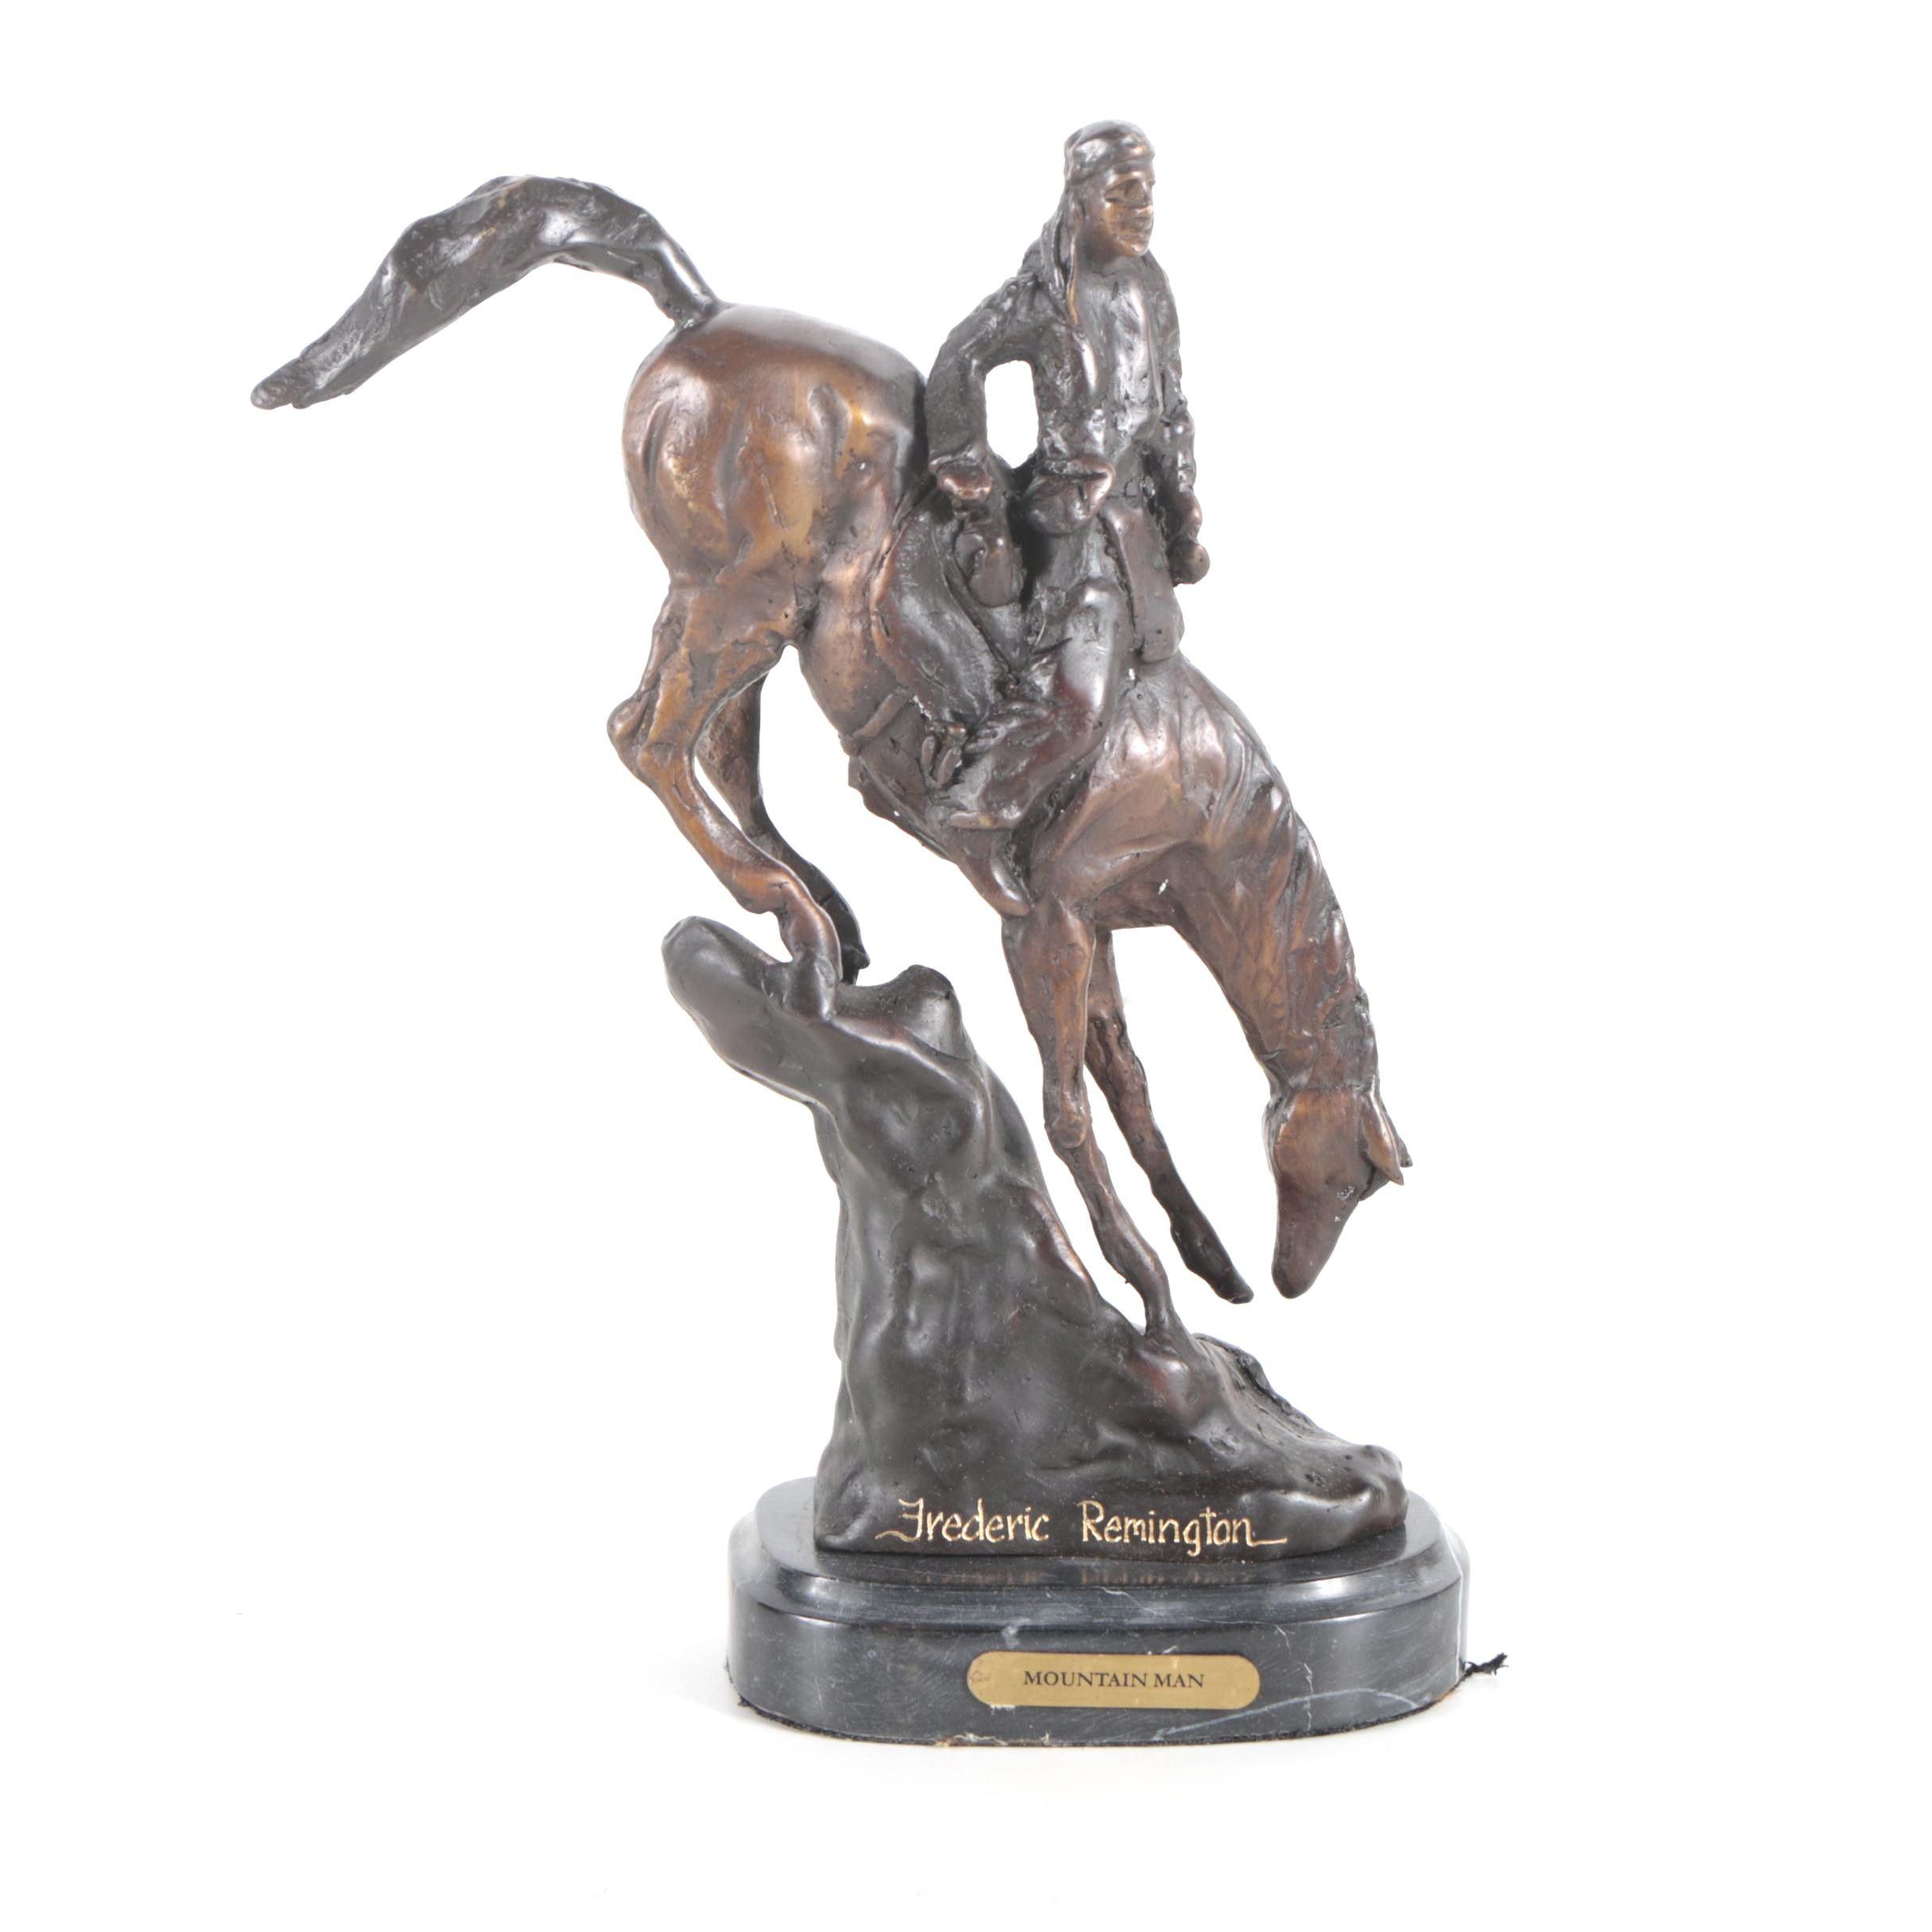 "Brass Sculpture After Frederic Remington ""Mountain Man"""